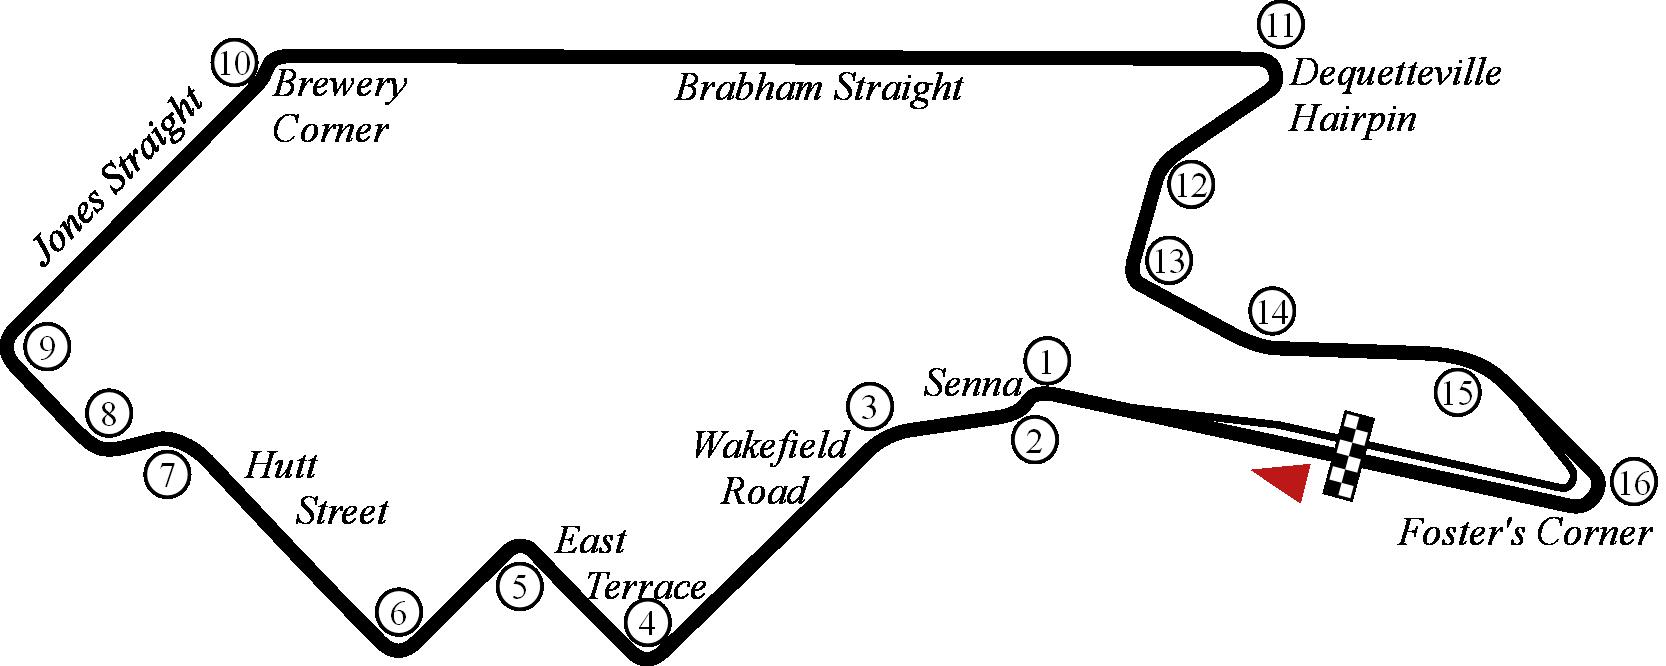 1989 Australian Grand Prix